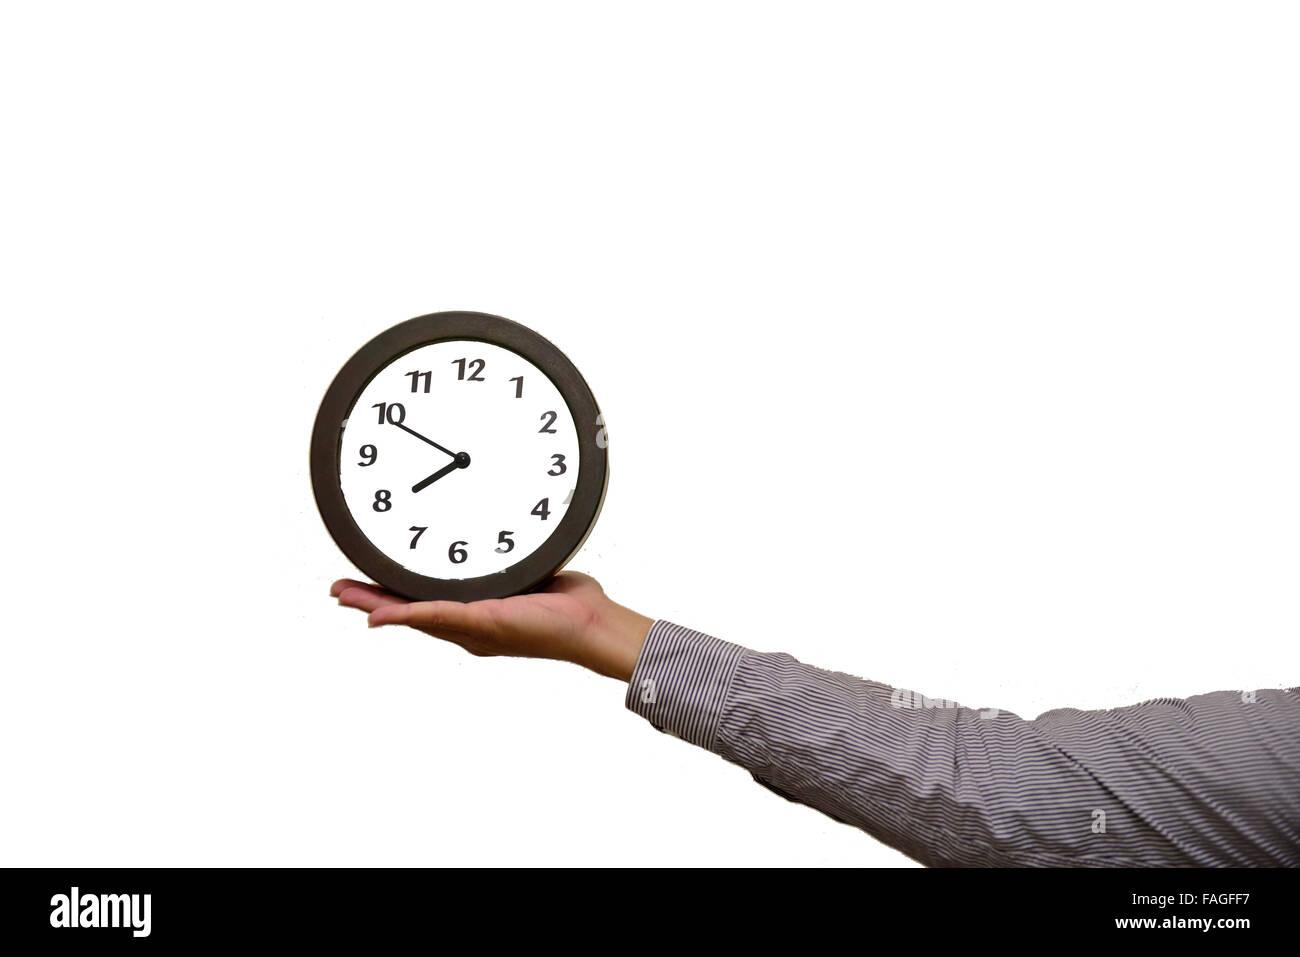 Time, lasting, waiting, travel, life - Stock Image